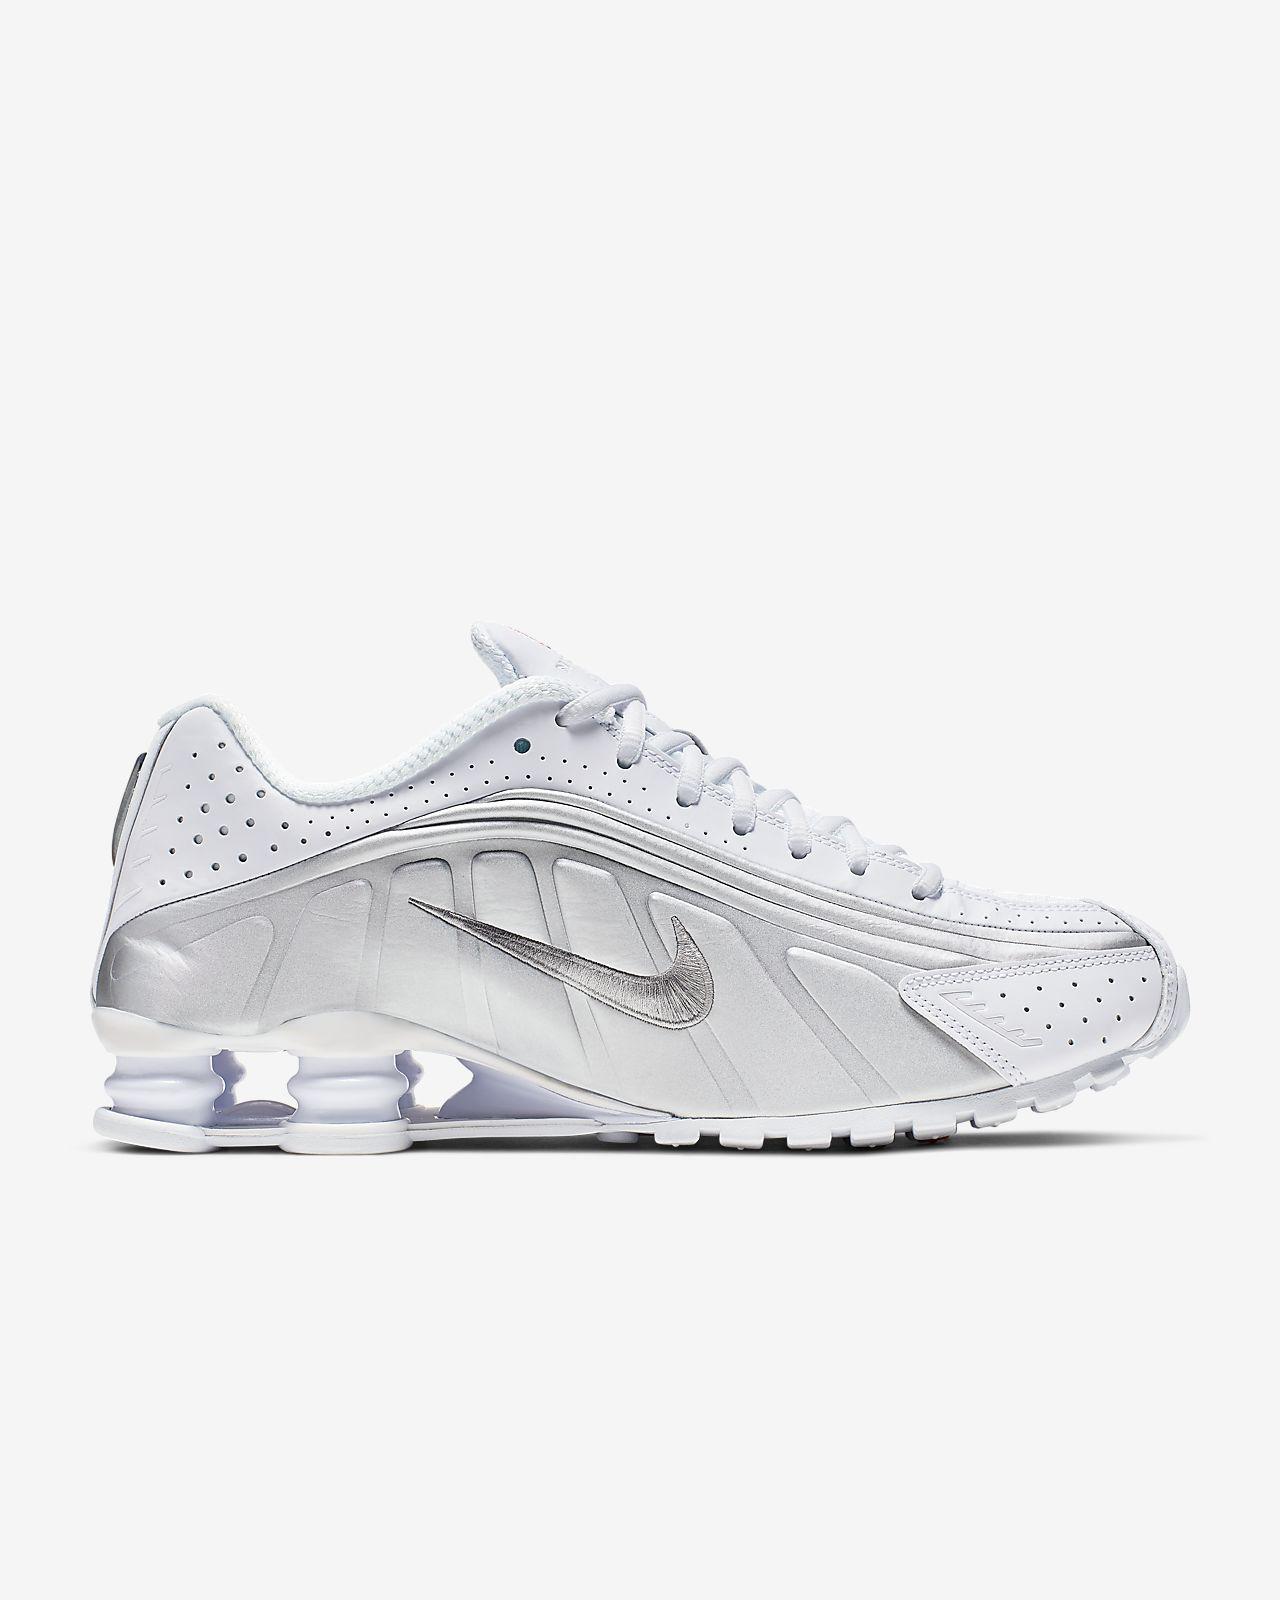 22302fd088 Nike Shox R4 Men's Shoe. Nike.com PT